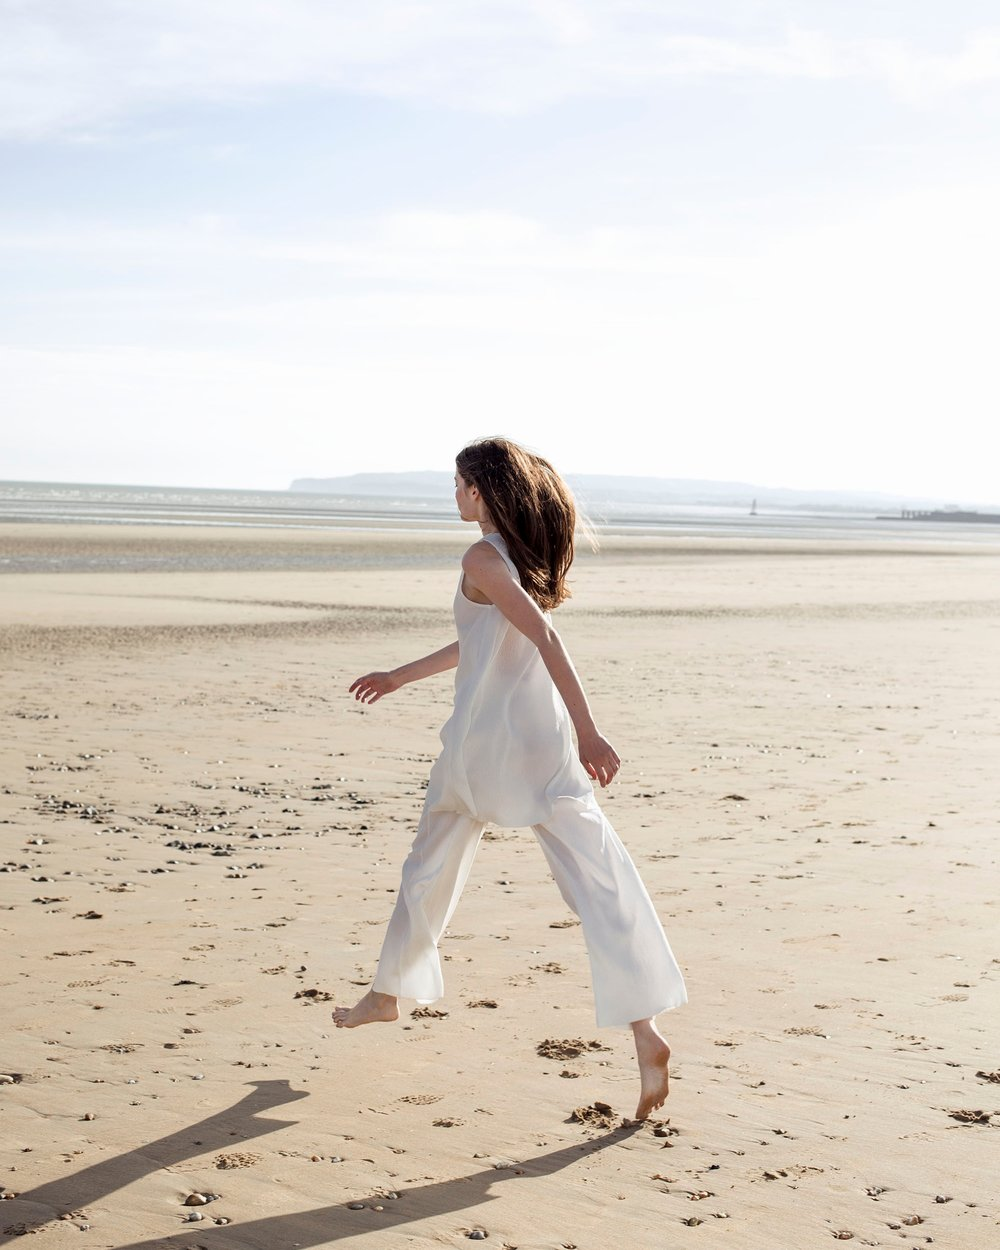 Fresh Air_Kristina Loewen_klein6.jpg